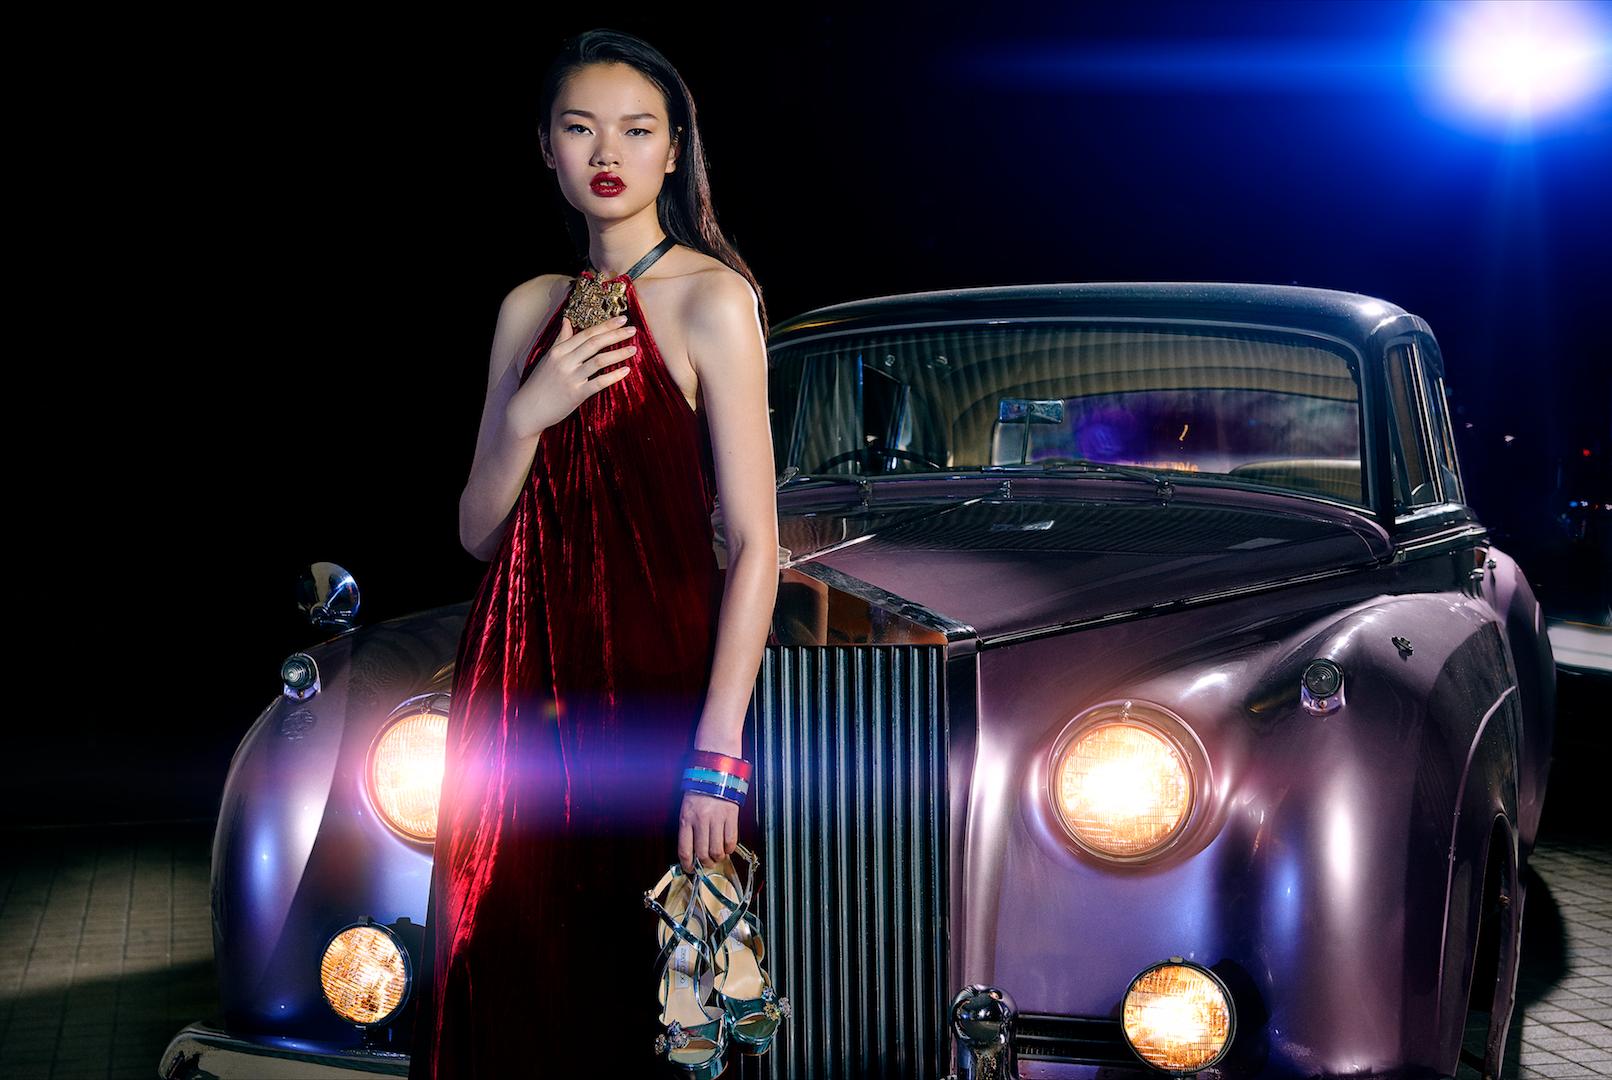 news_raul docasar_SCMP Christmas Fashion10.png